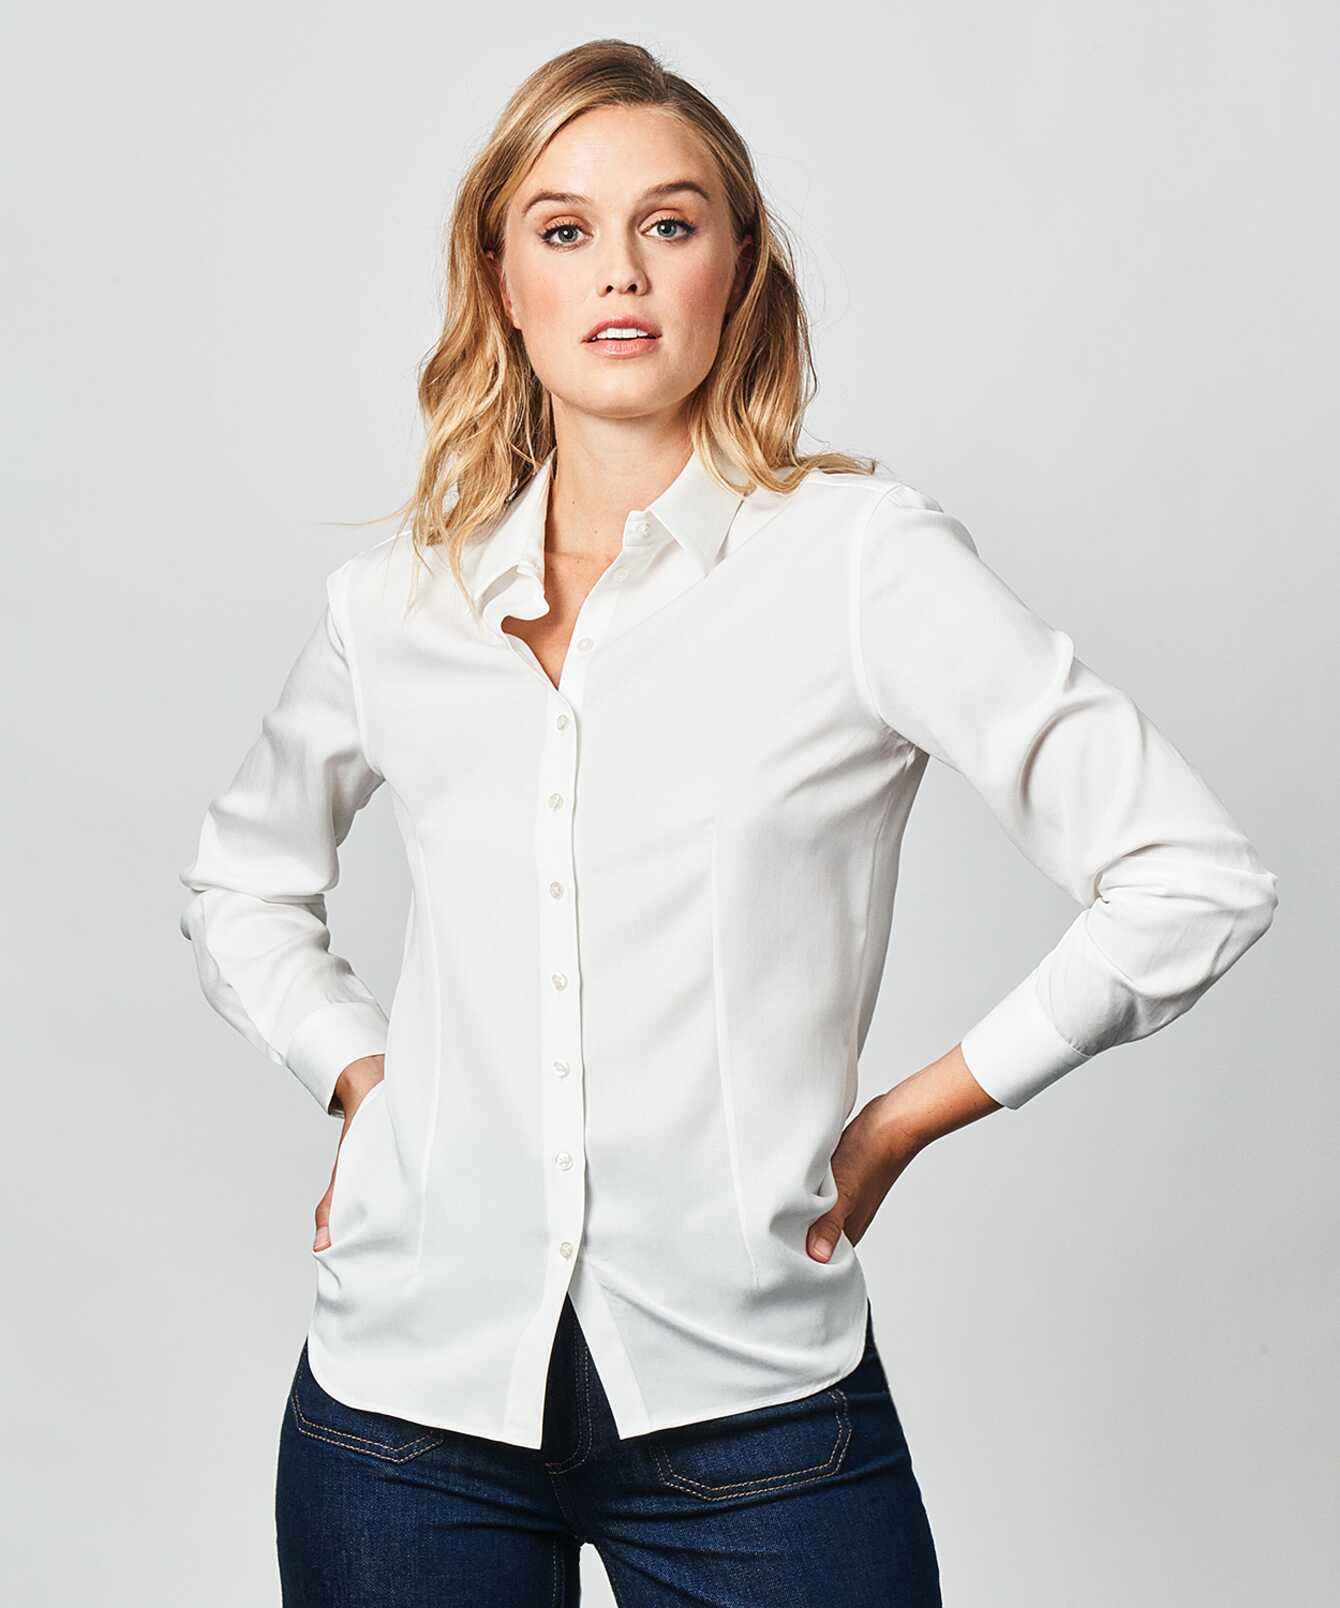 Skjorta Tilde Soft Creme The Shirt Factory